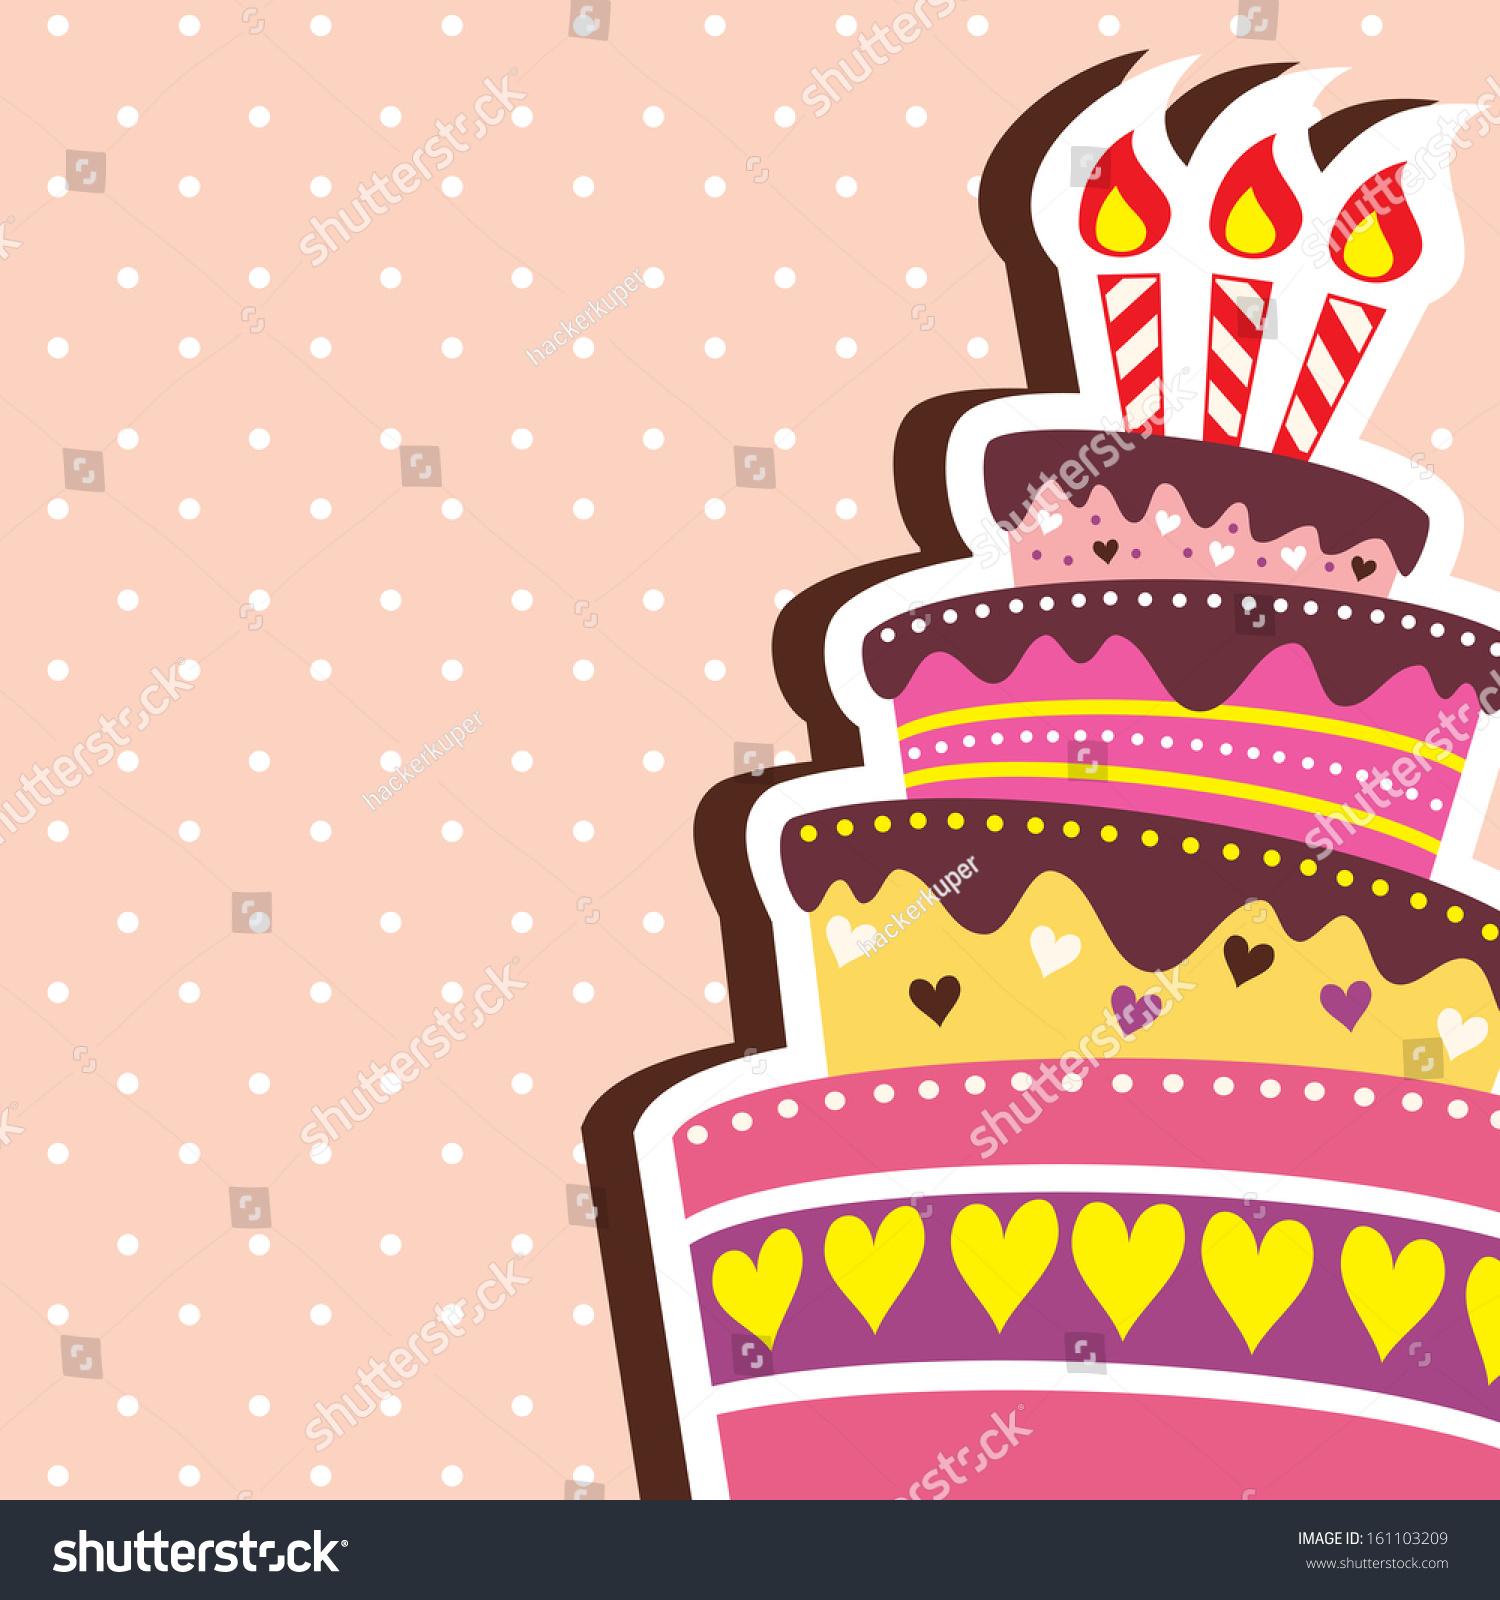 Colorful Layered Happy Birthday Cake Background Stock Illustration